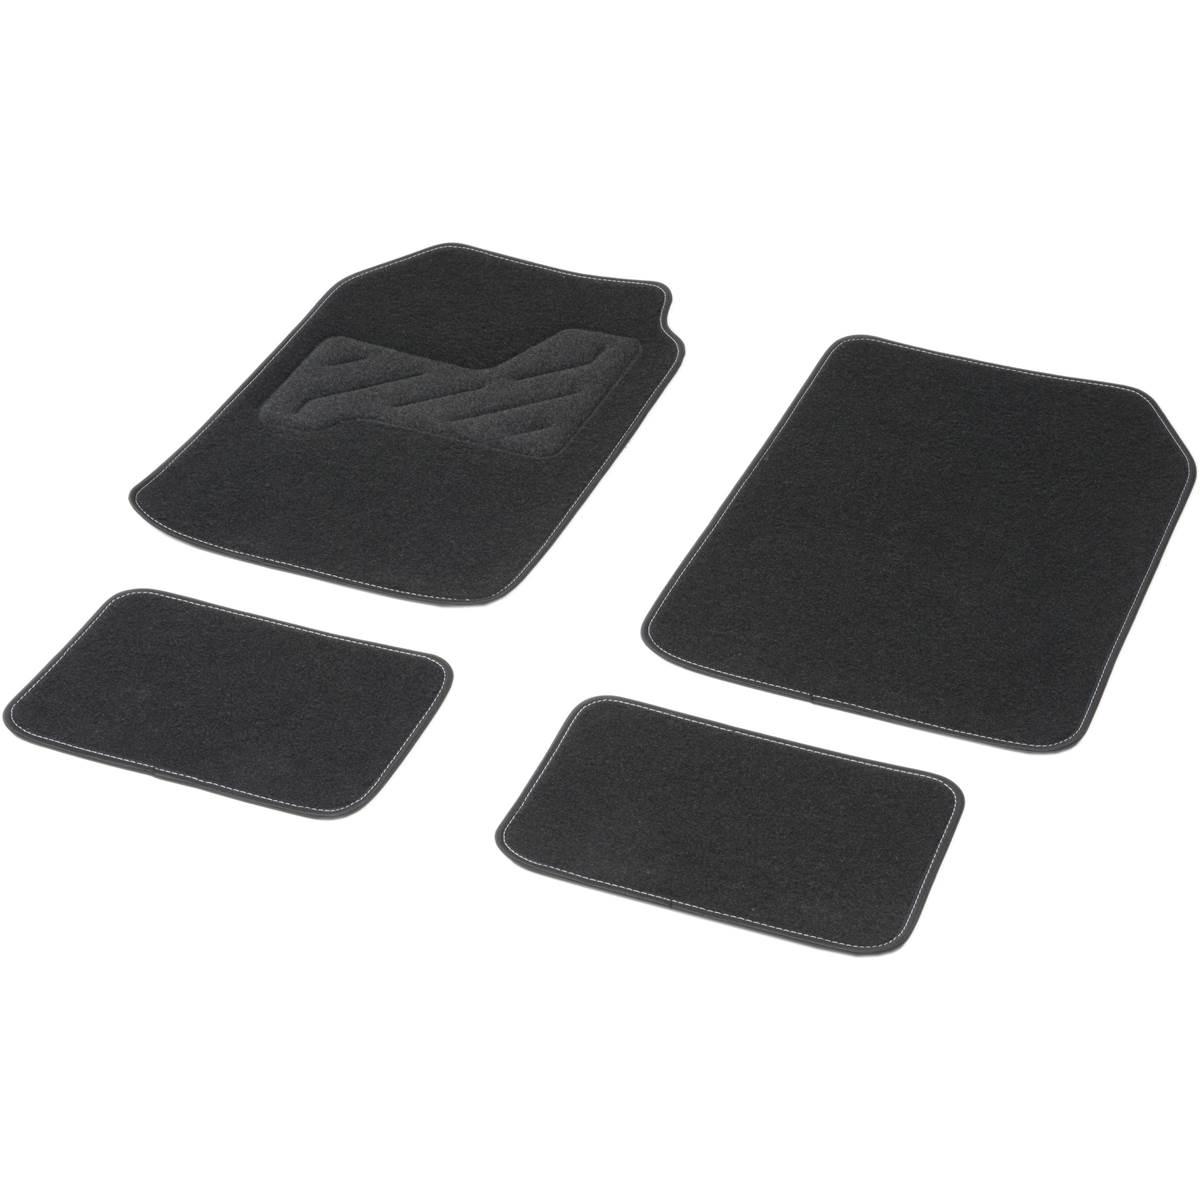 equipement dbs achat vente de equipement pas cher. Black Bedroom Furniture Sets. Home Design Ideas